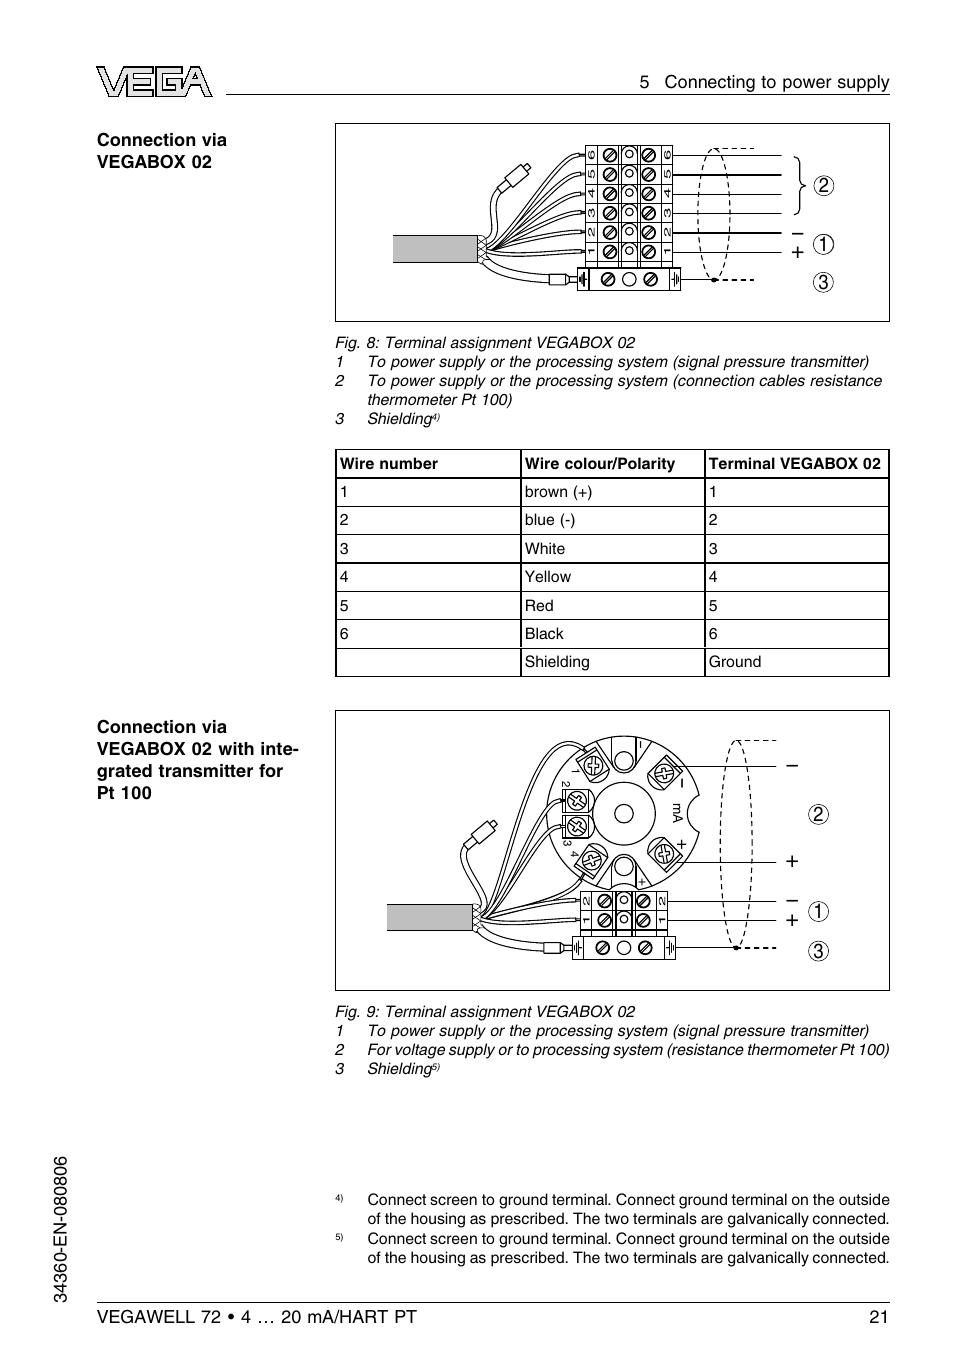 Vega Vegawell 72 4 20 Ma Hart Pt 100 User Manual Page 21 44 Wiring Diagram